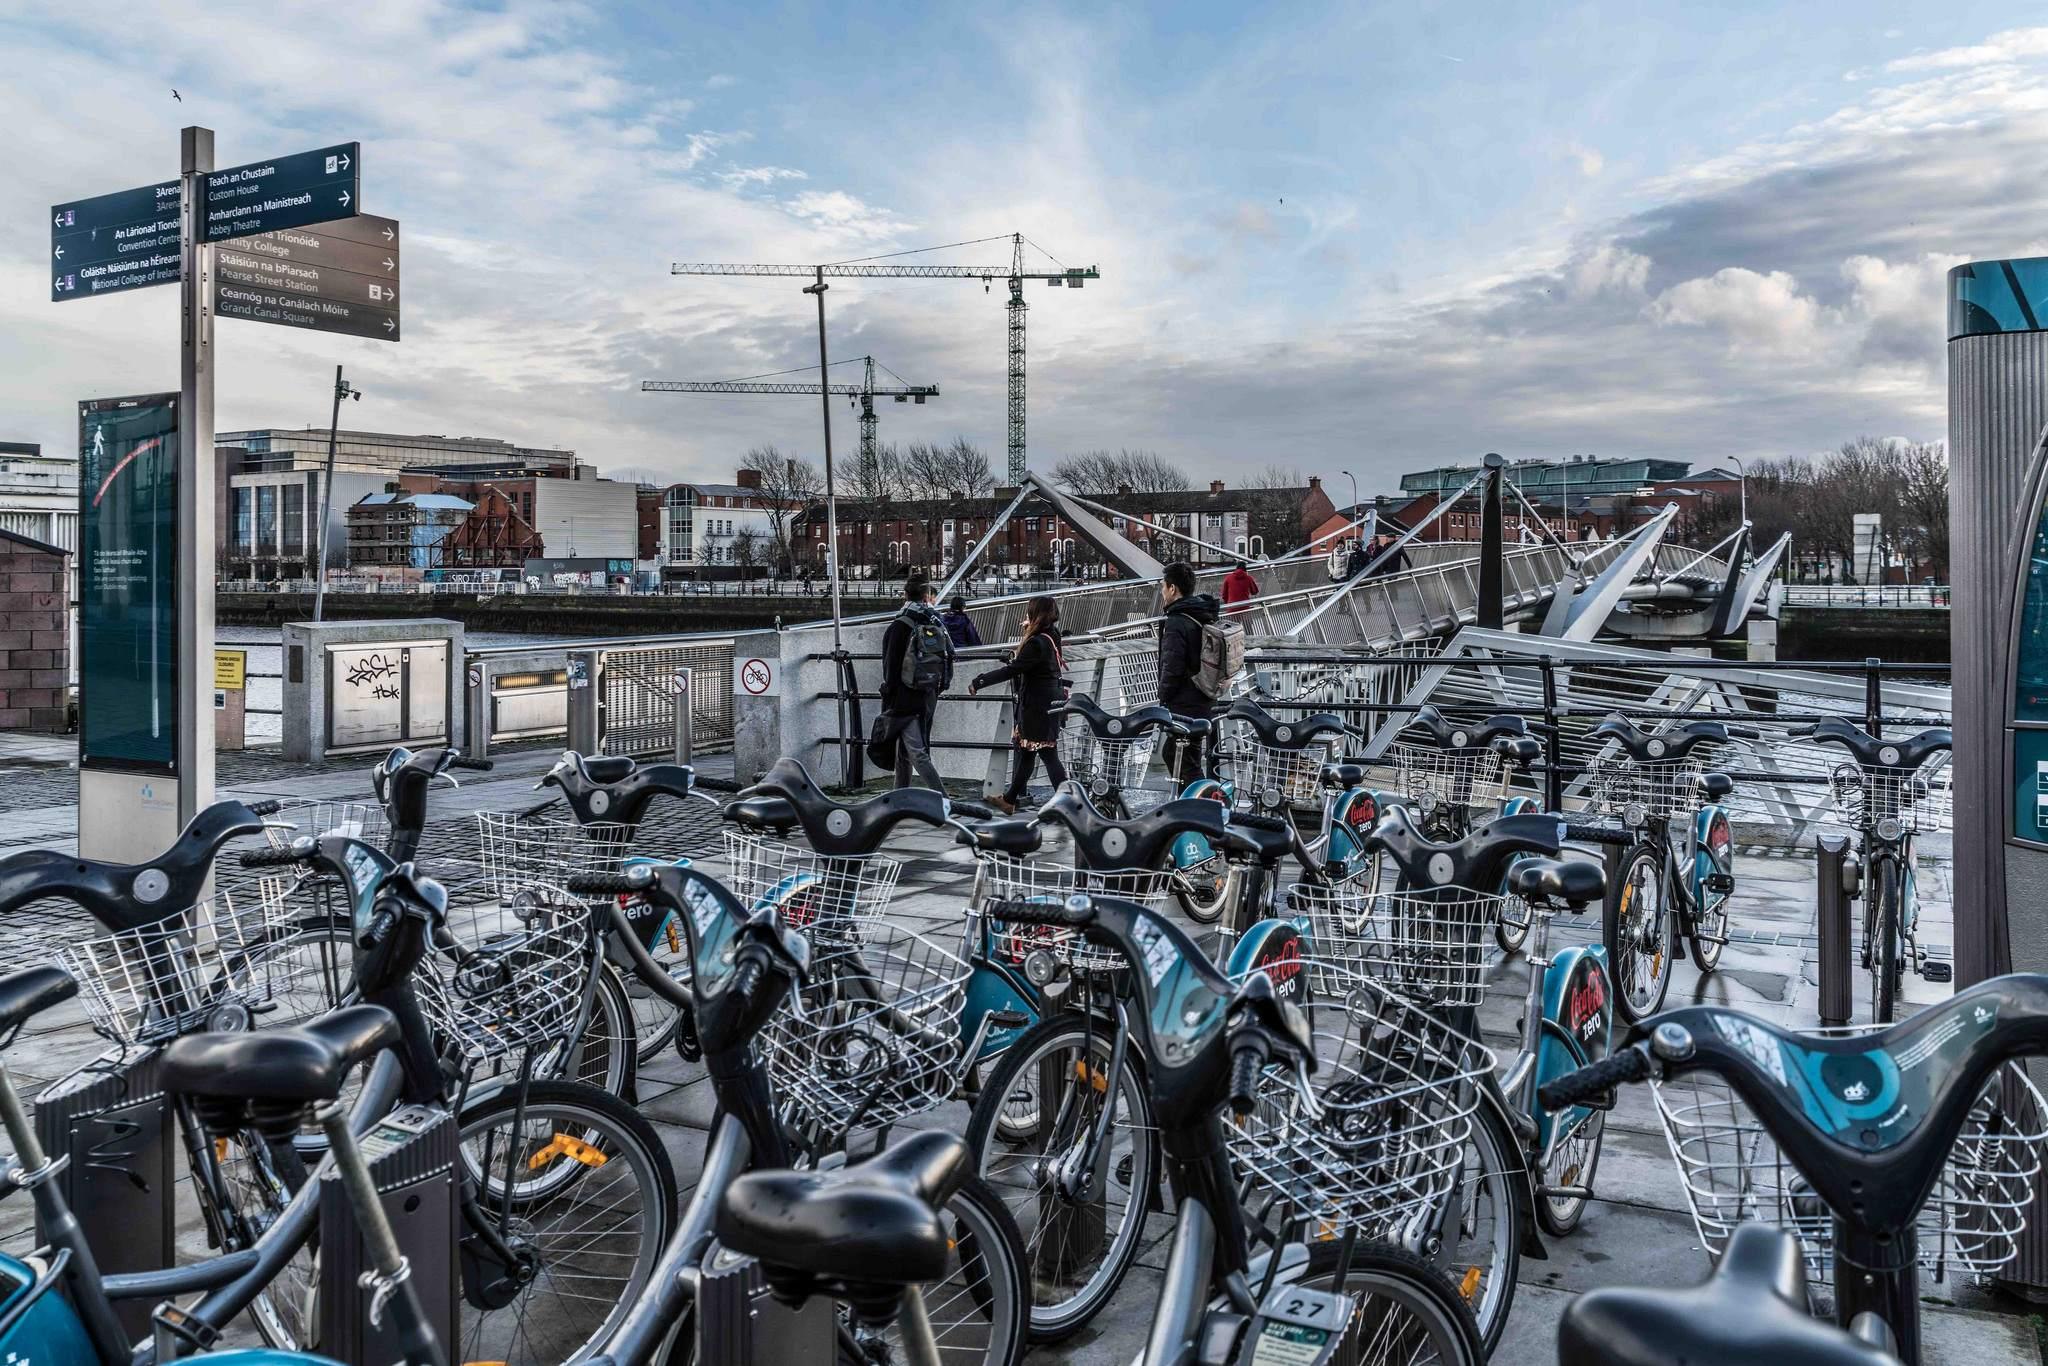 dublin docklands11 Walking Around Dublin Docklands by Marphy